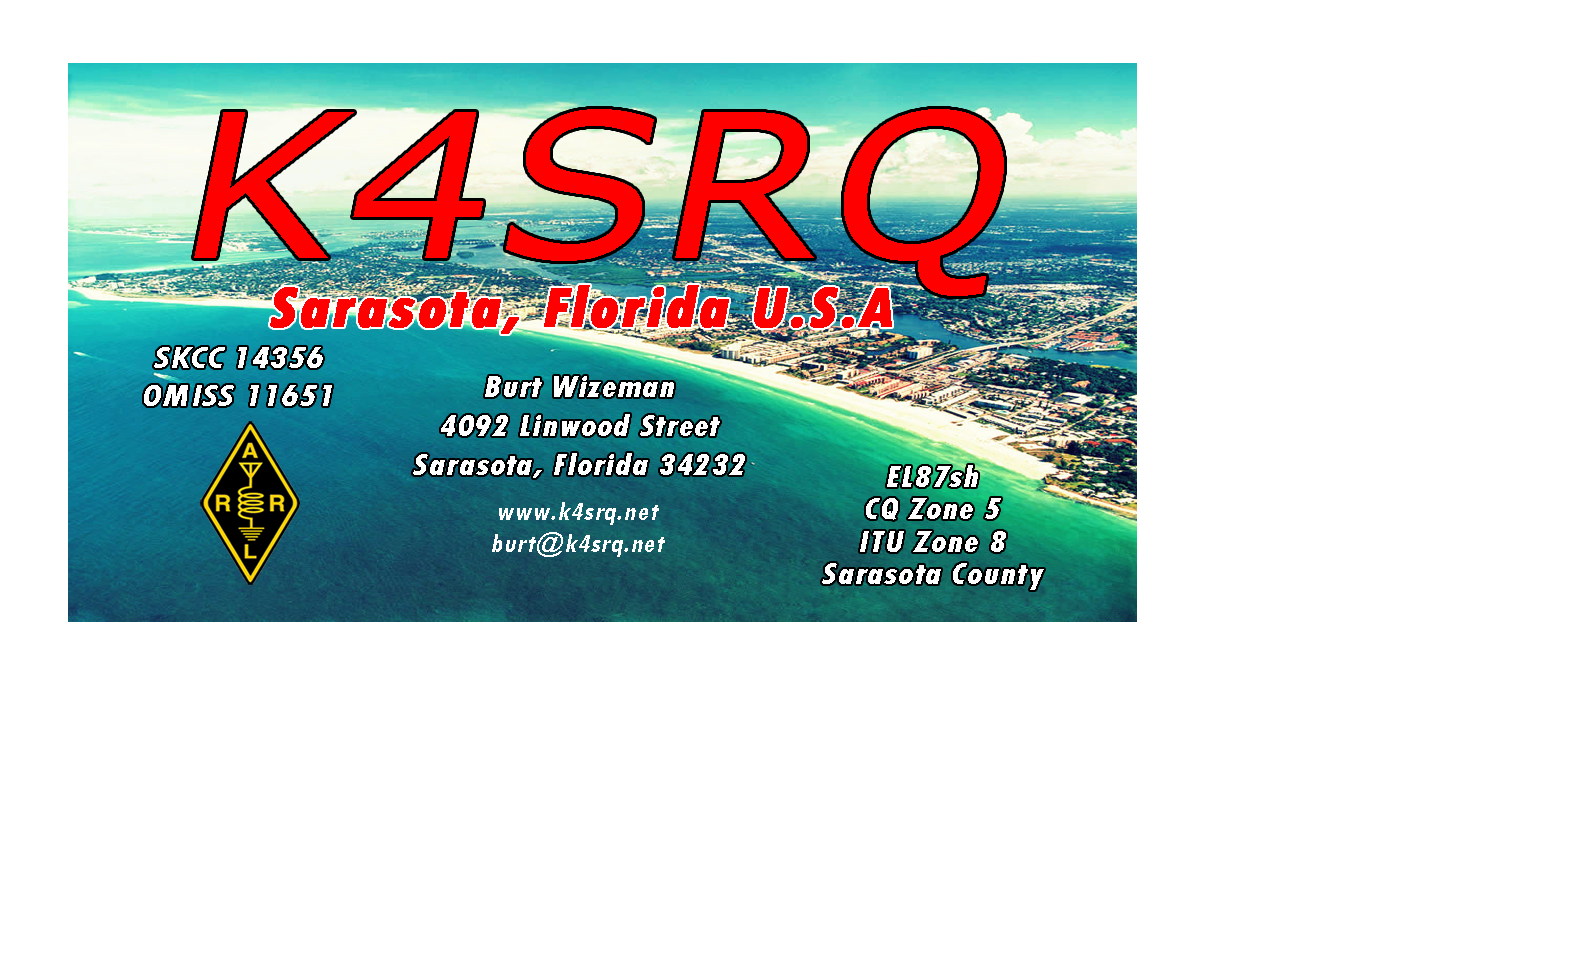 Virtual QTH of K4SRQ